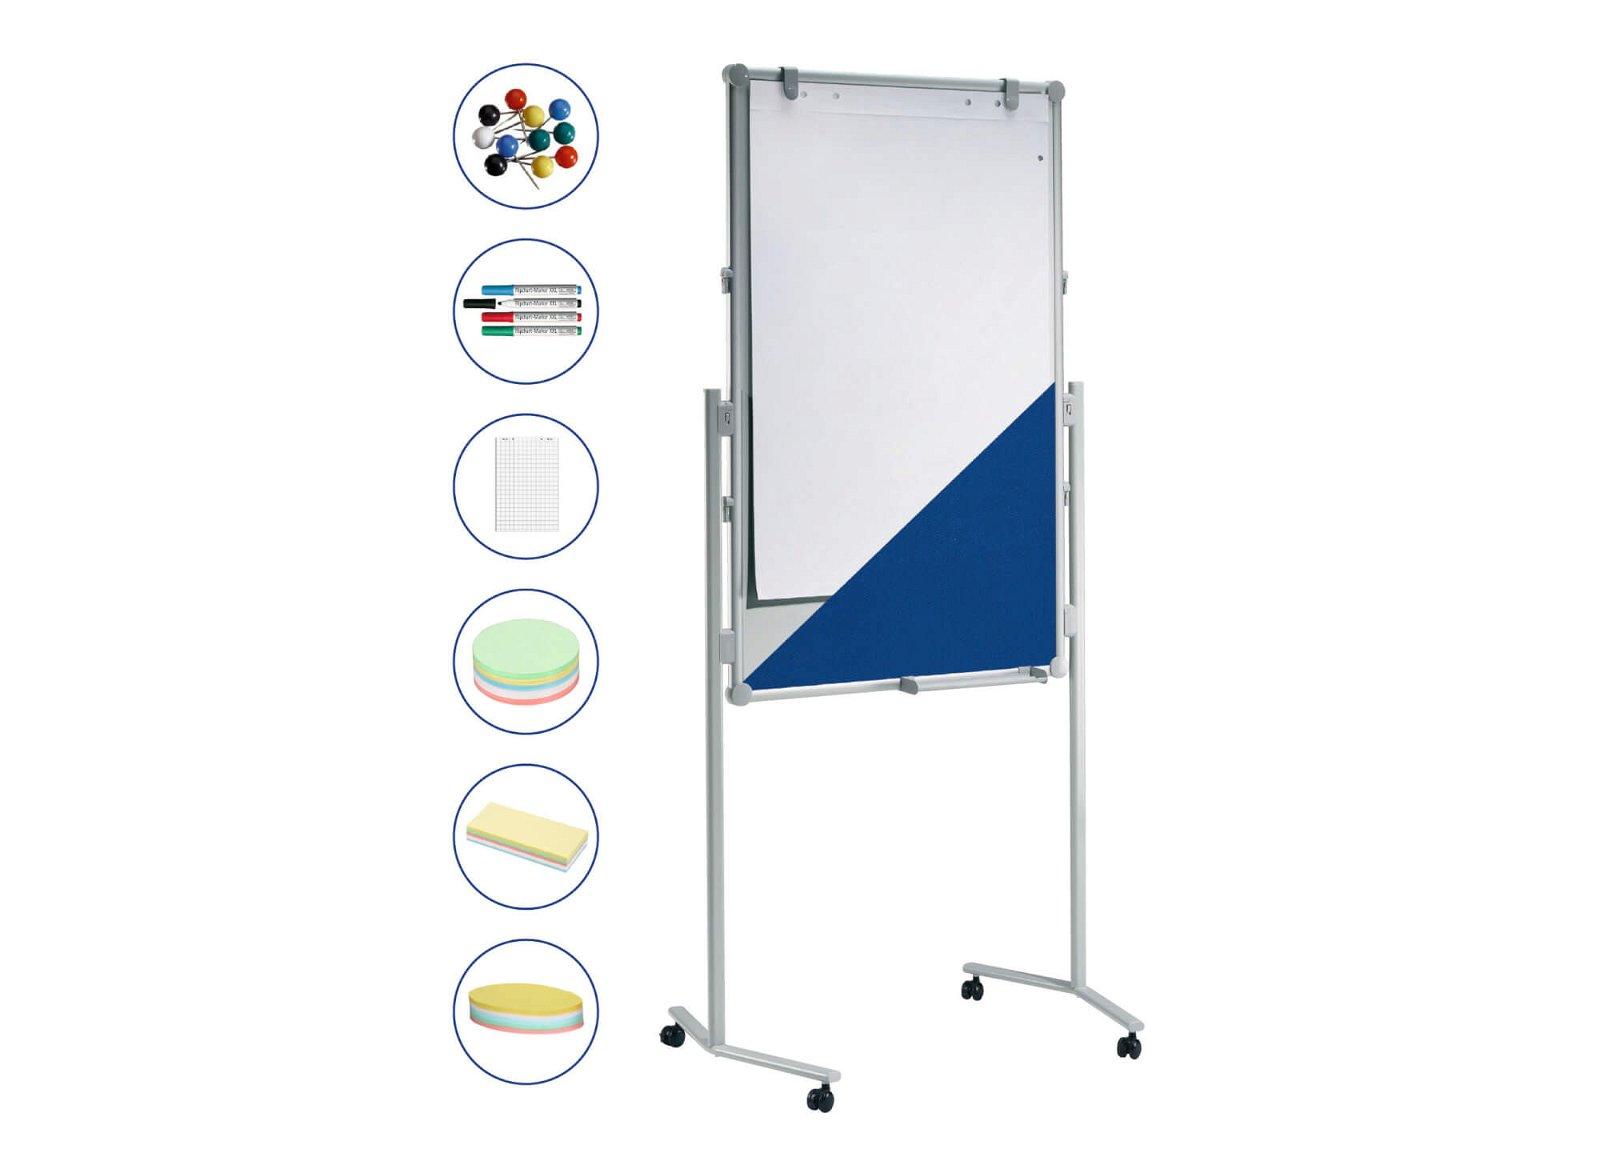 Moderationstafel MAULpro Textil/WB Set, 120x75 cm, grau